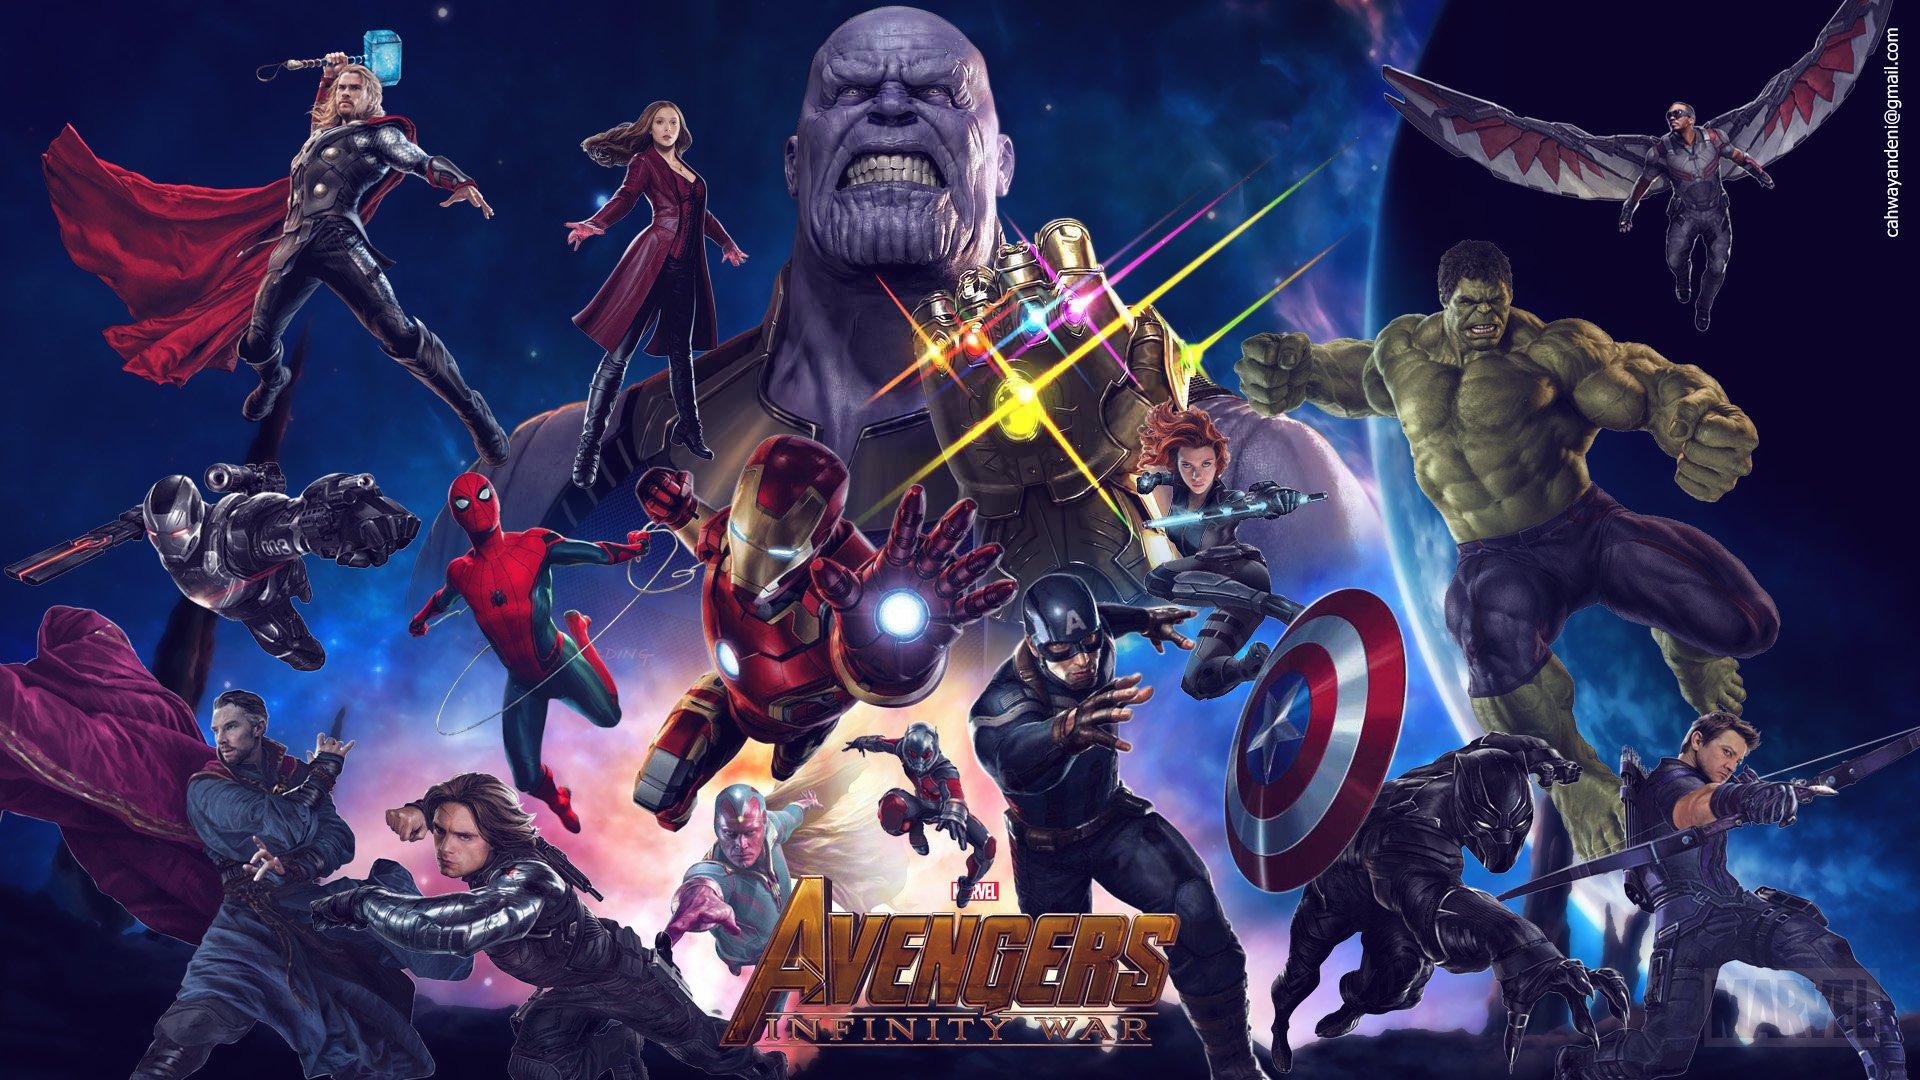 Black Panther 2018 Movie Still Full Hd Wallpaper: Avengers: Infinity War HD Wallpaper